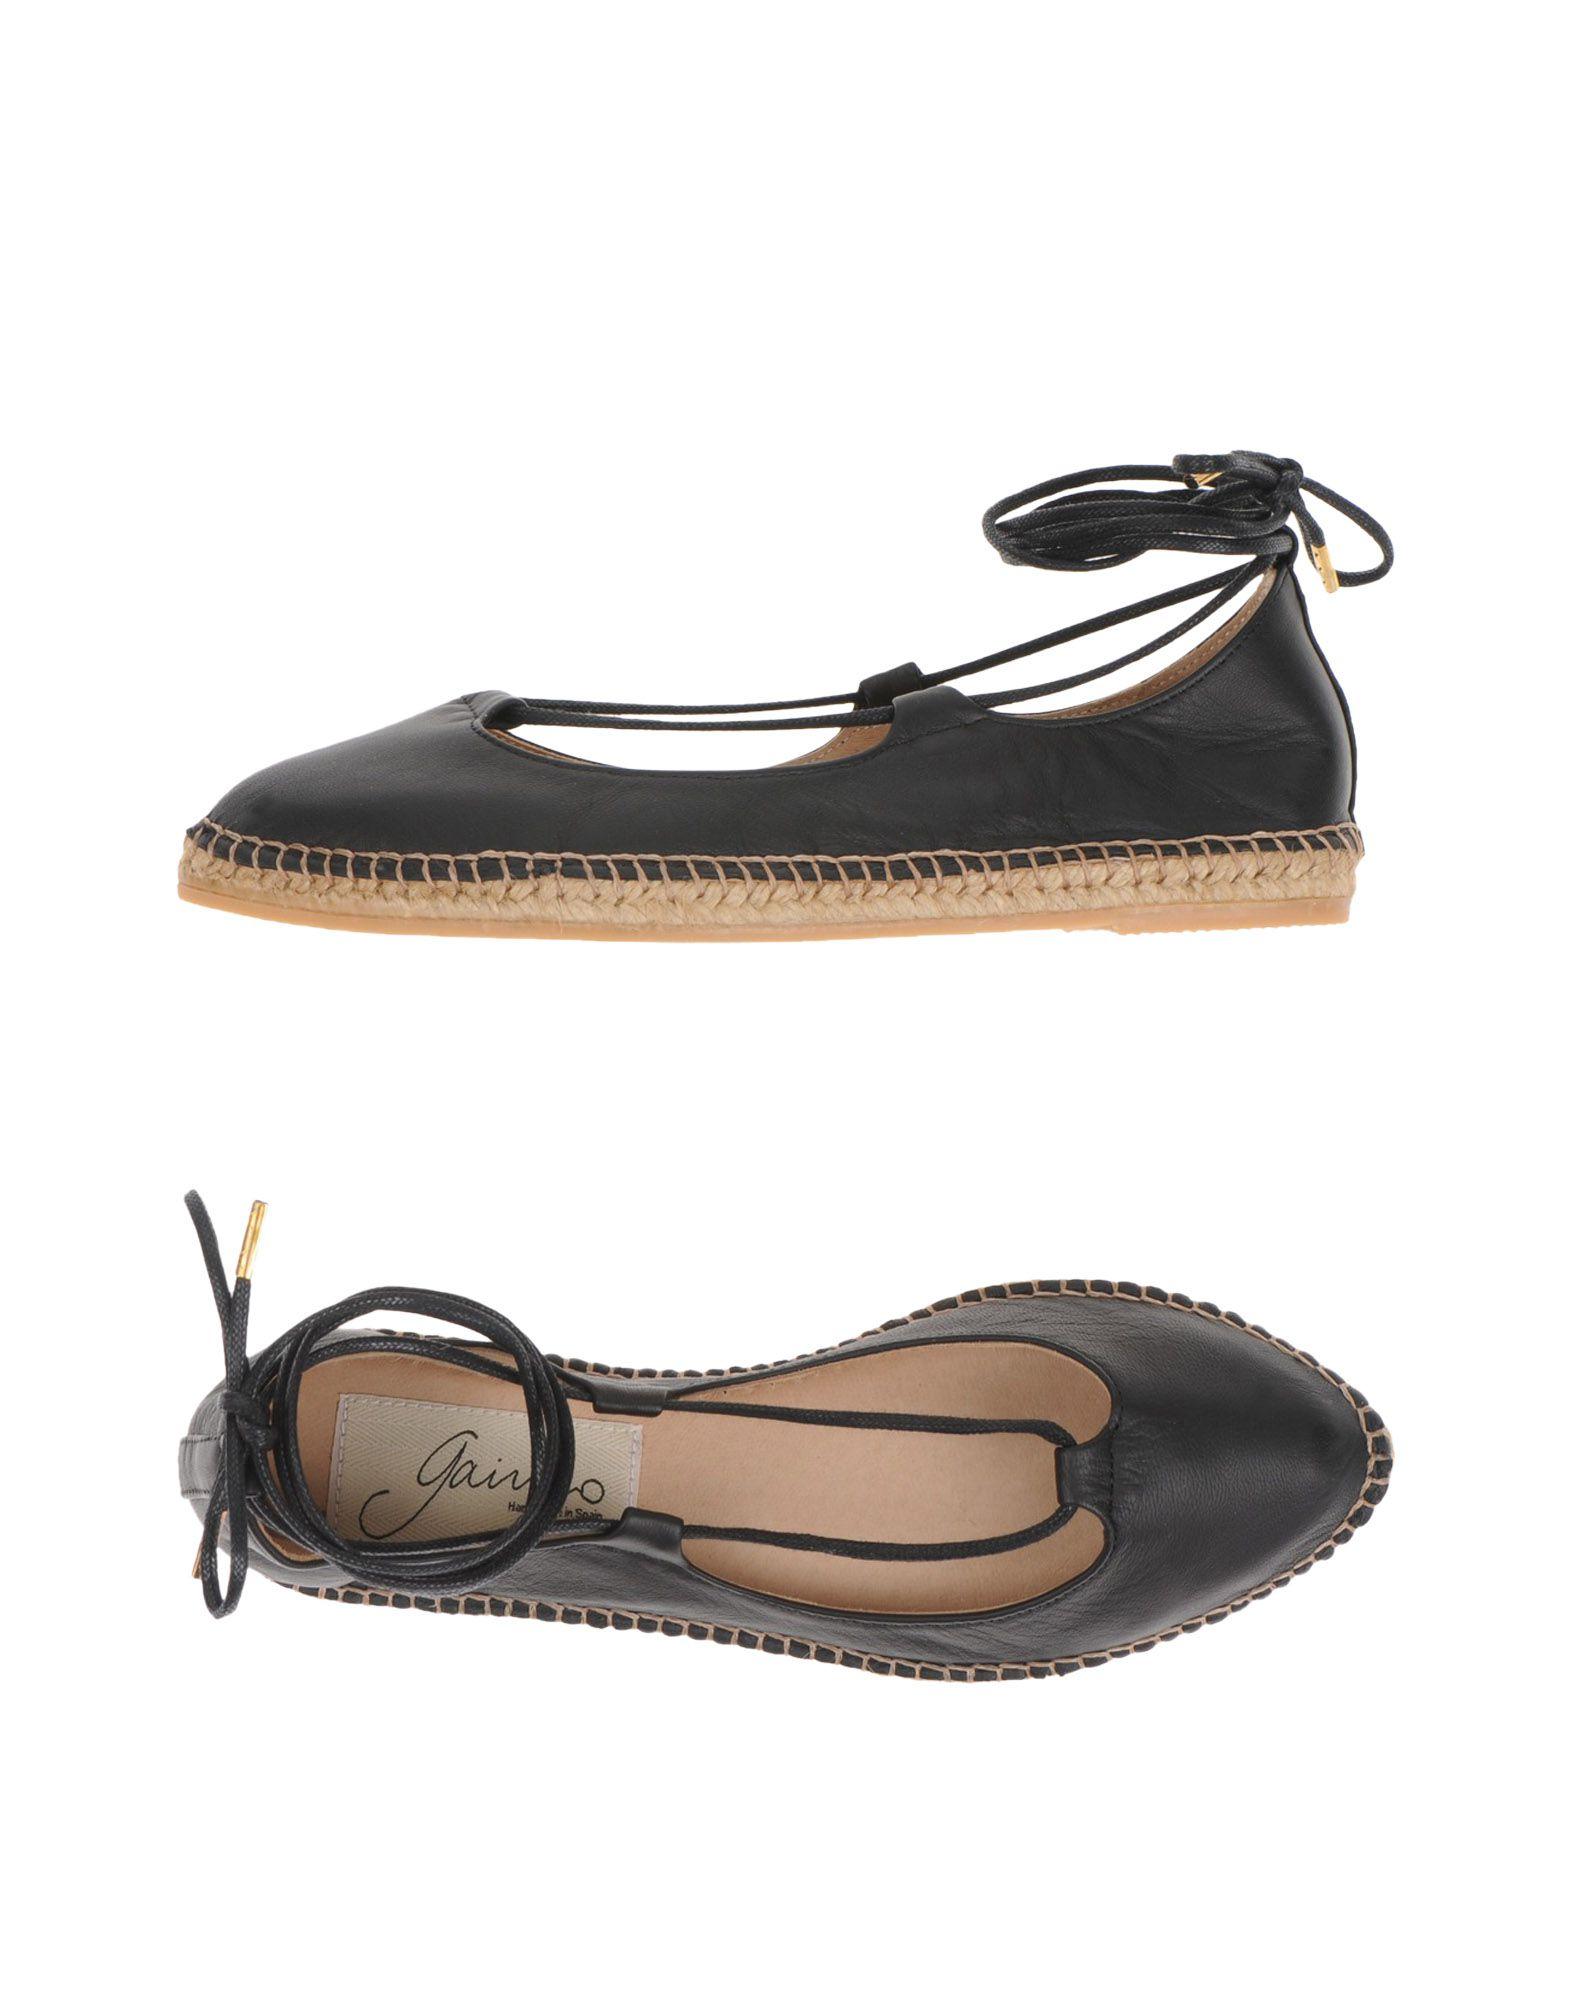 Gaimo Espadrilles Damen  11384499AD Gute Qualität beliebte Schuhe